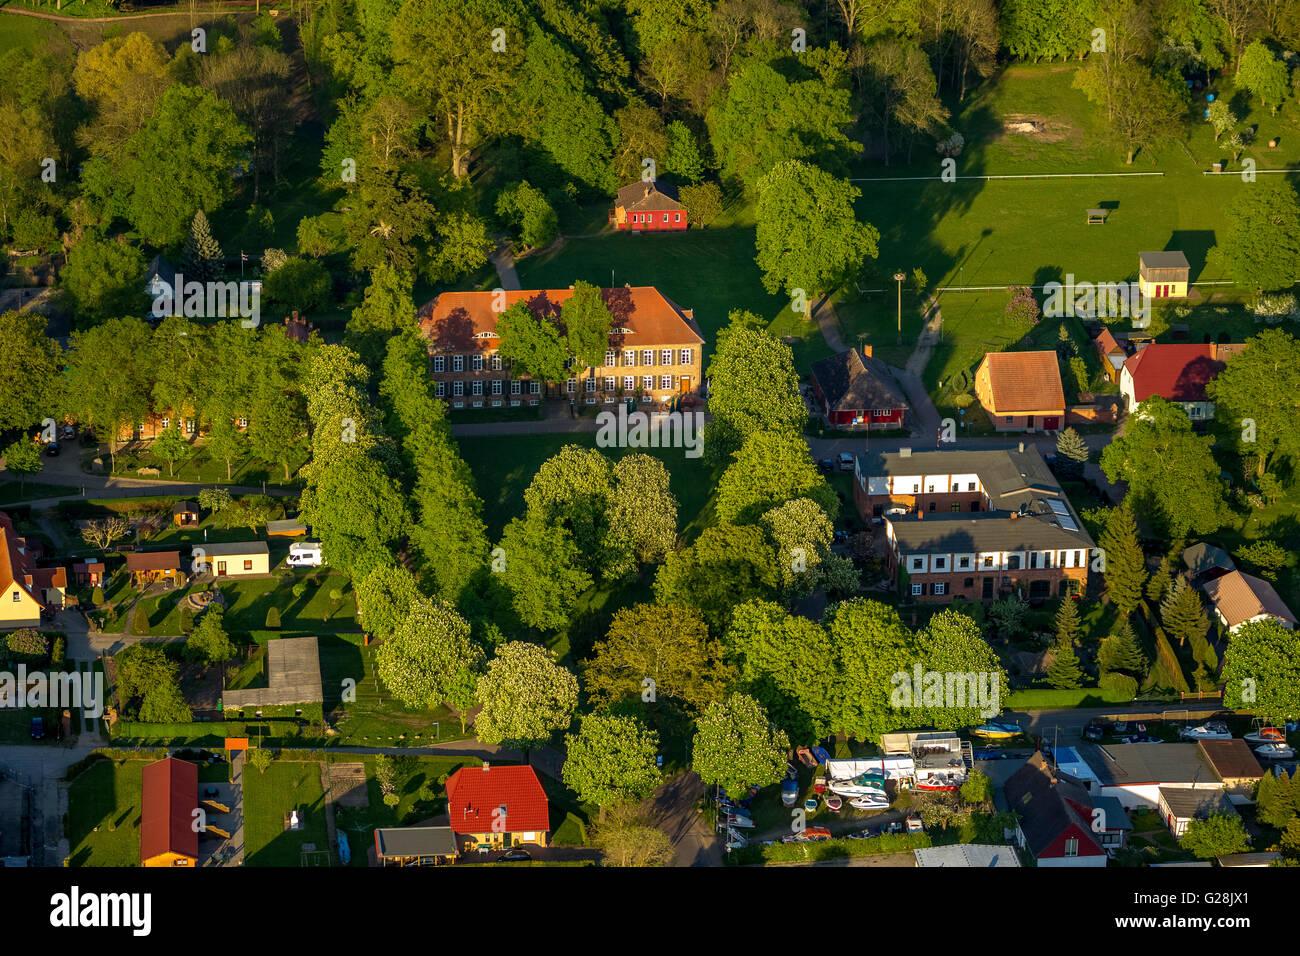 Aerial view, Romantik Hotel Gutshaus Ludorf, restaurant Morizianer, Ludorf, Mecklenburg Lake District, Mecklenburg - Stock Image